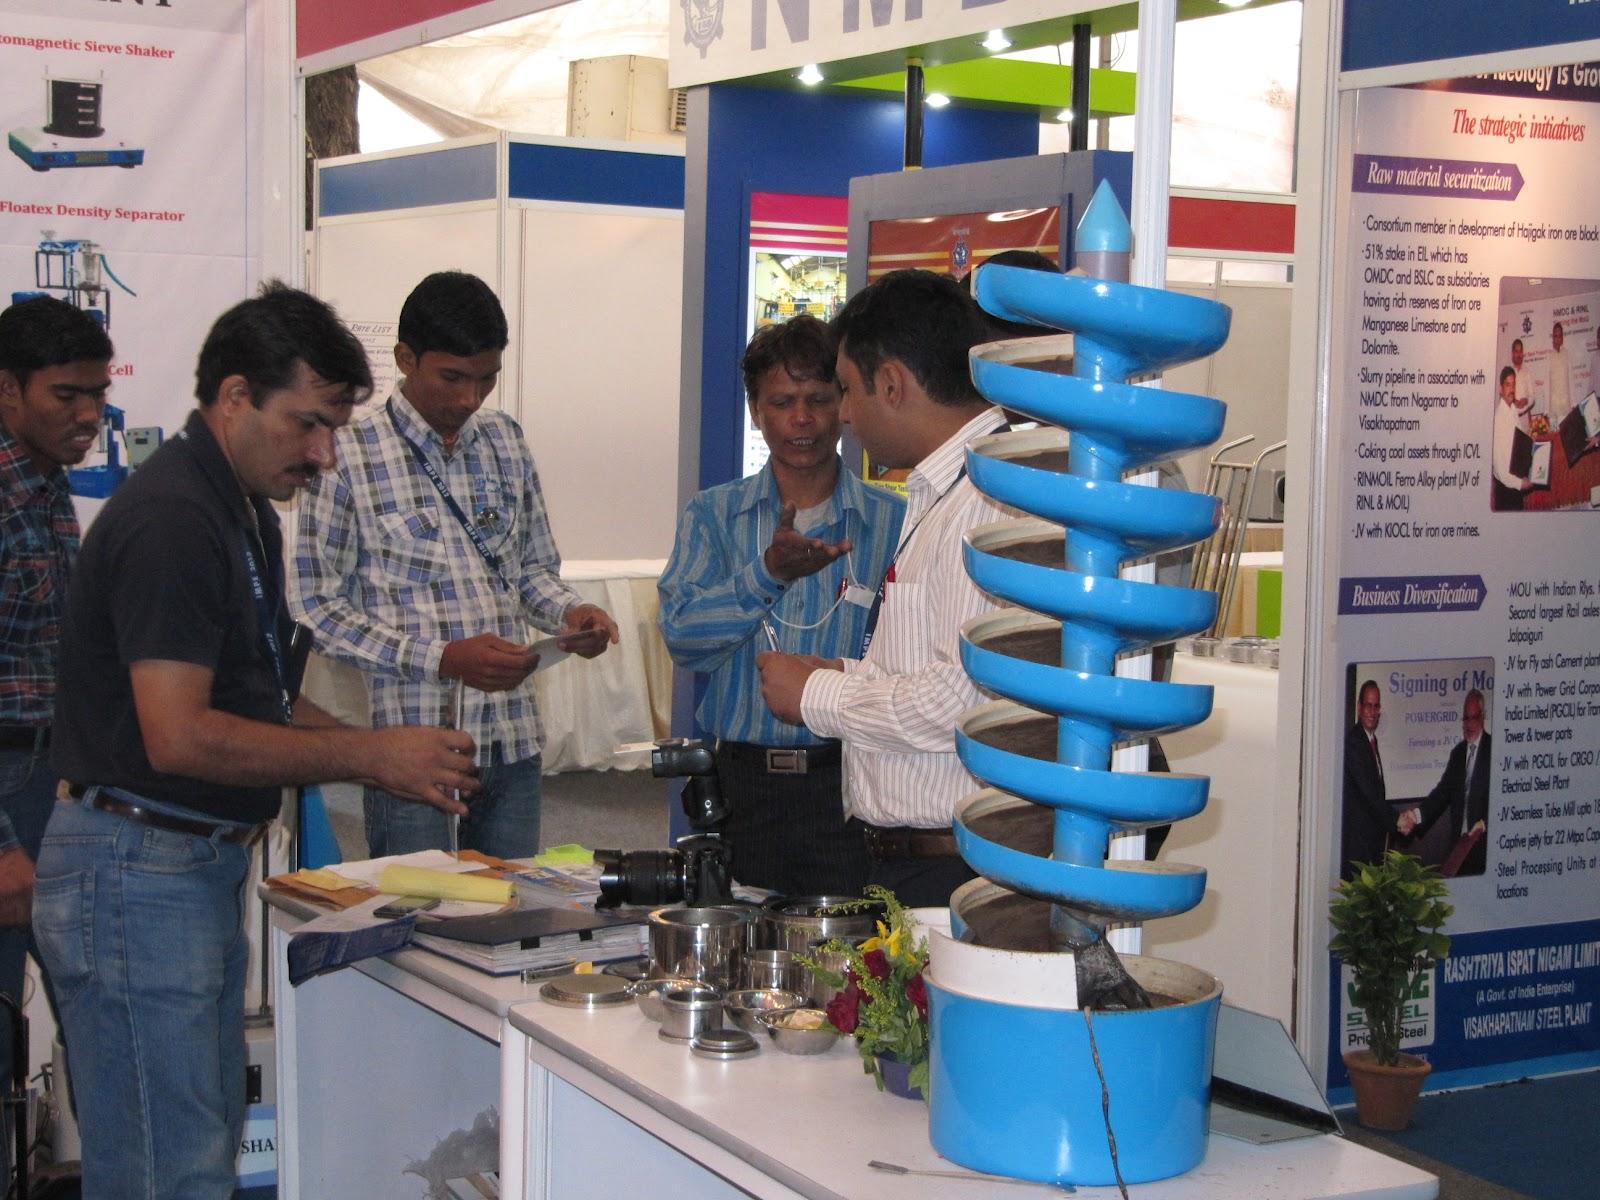 MEI Blog: XXVI International Mineral Processing Congress Conference